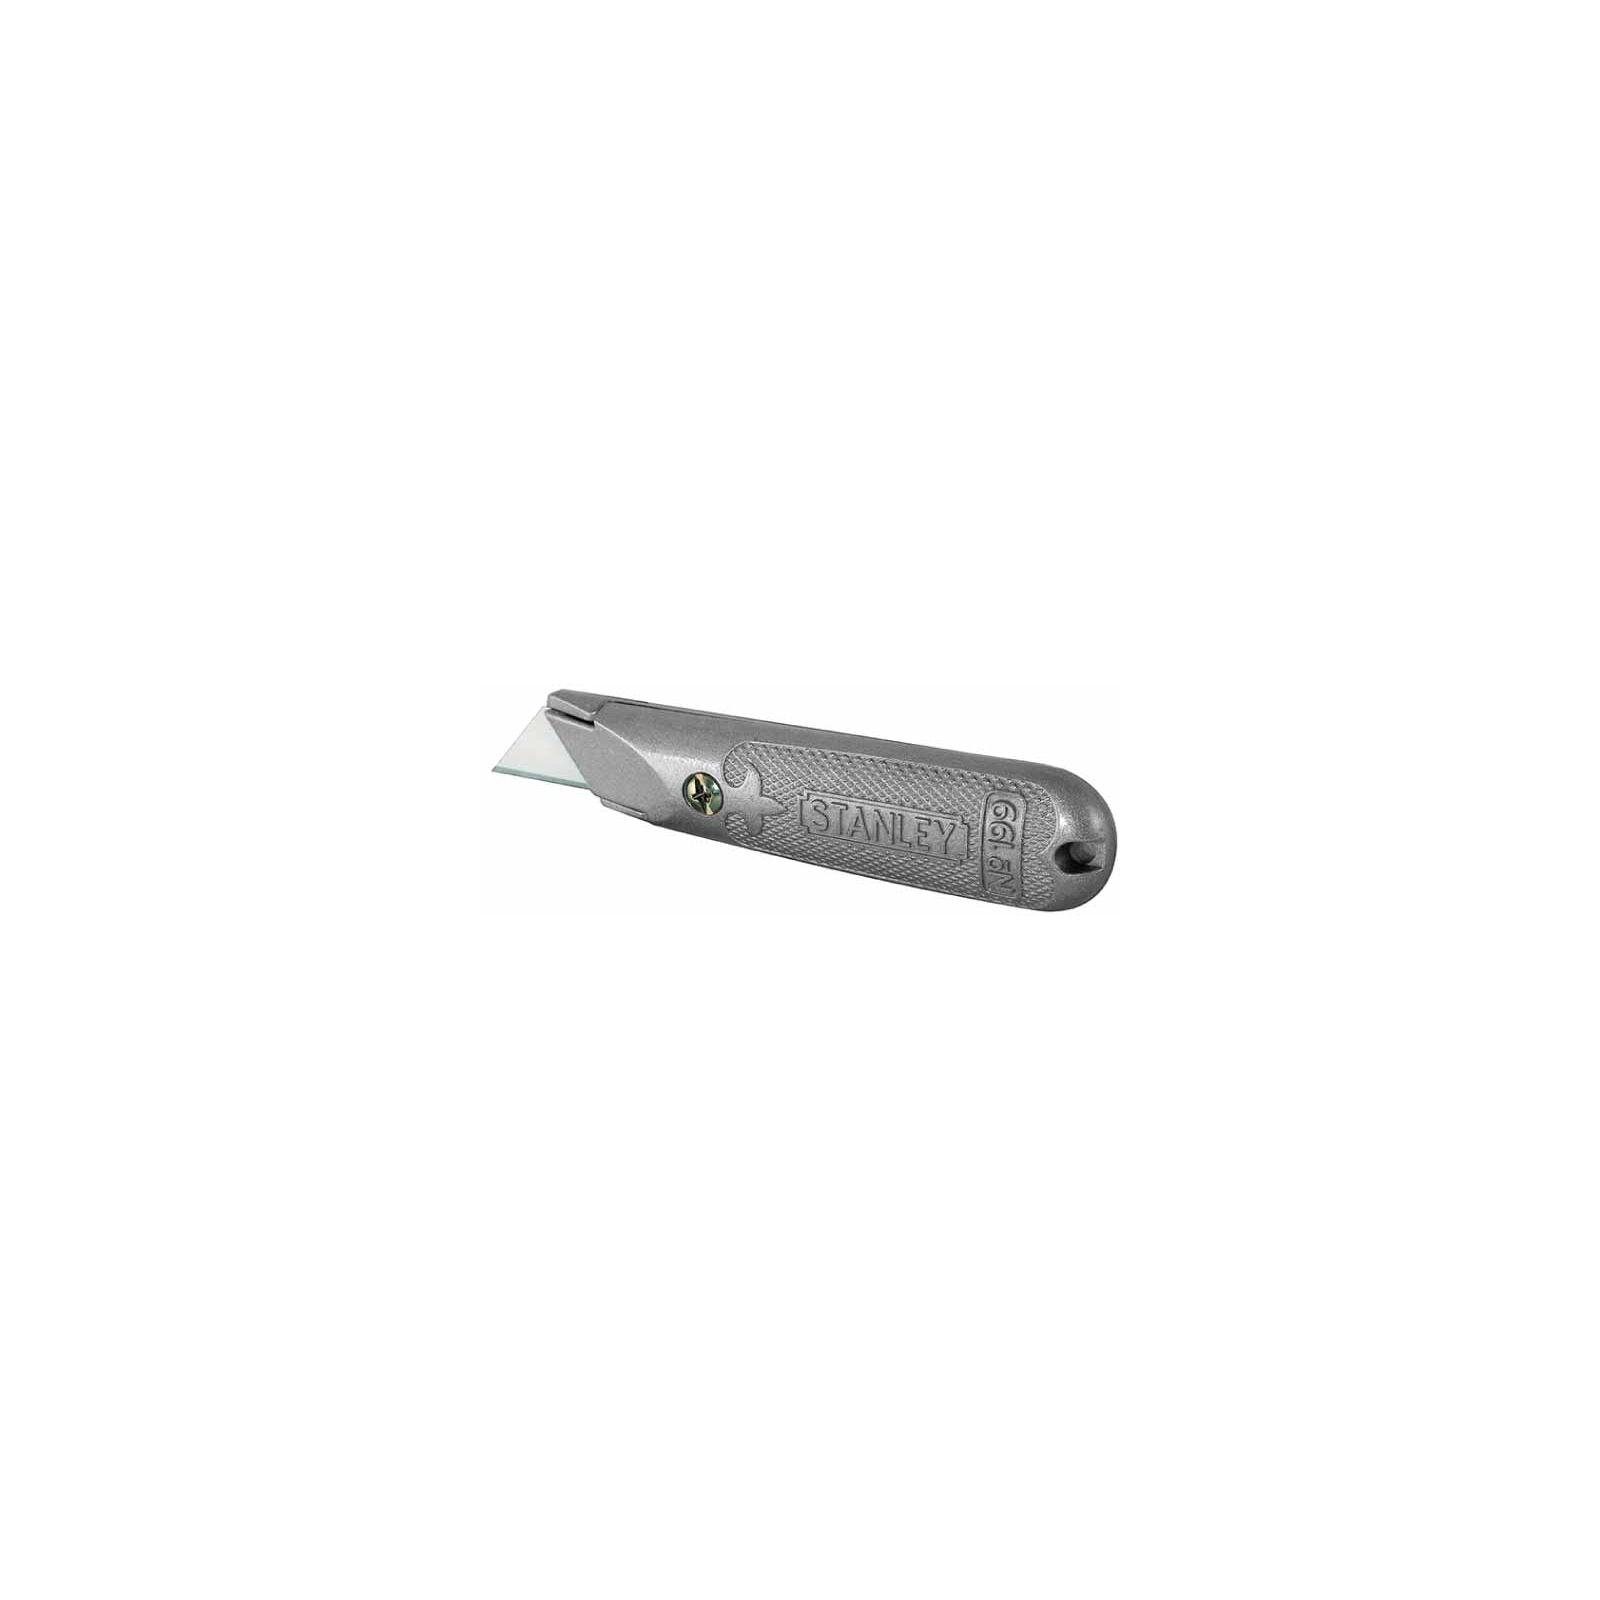 Нож монтажный Stanley с фикс. лезвием, длина ножа 140мм (2-10-199)